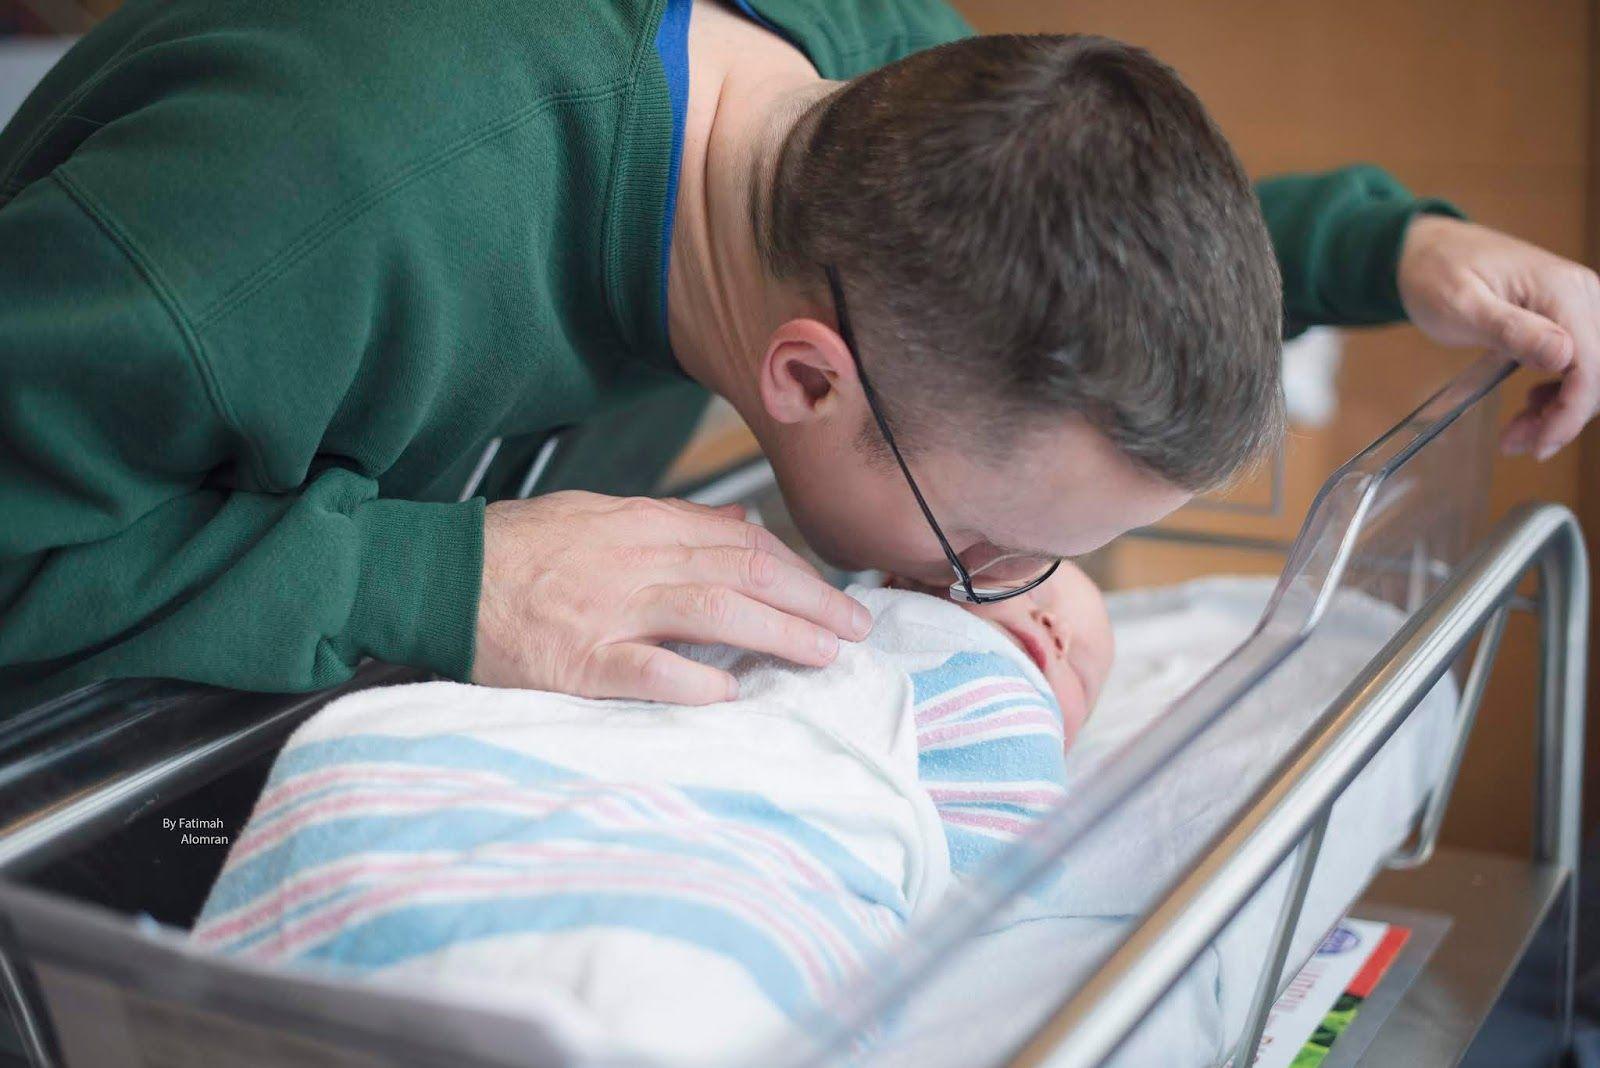 تصوير مواليد في المستشفى Hospital Newborn Session Hoop Earrings Best